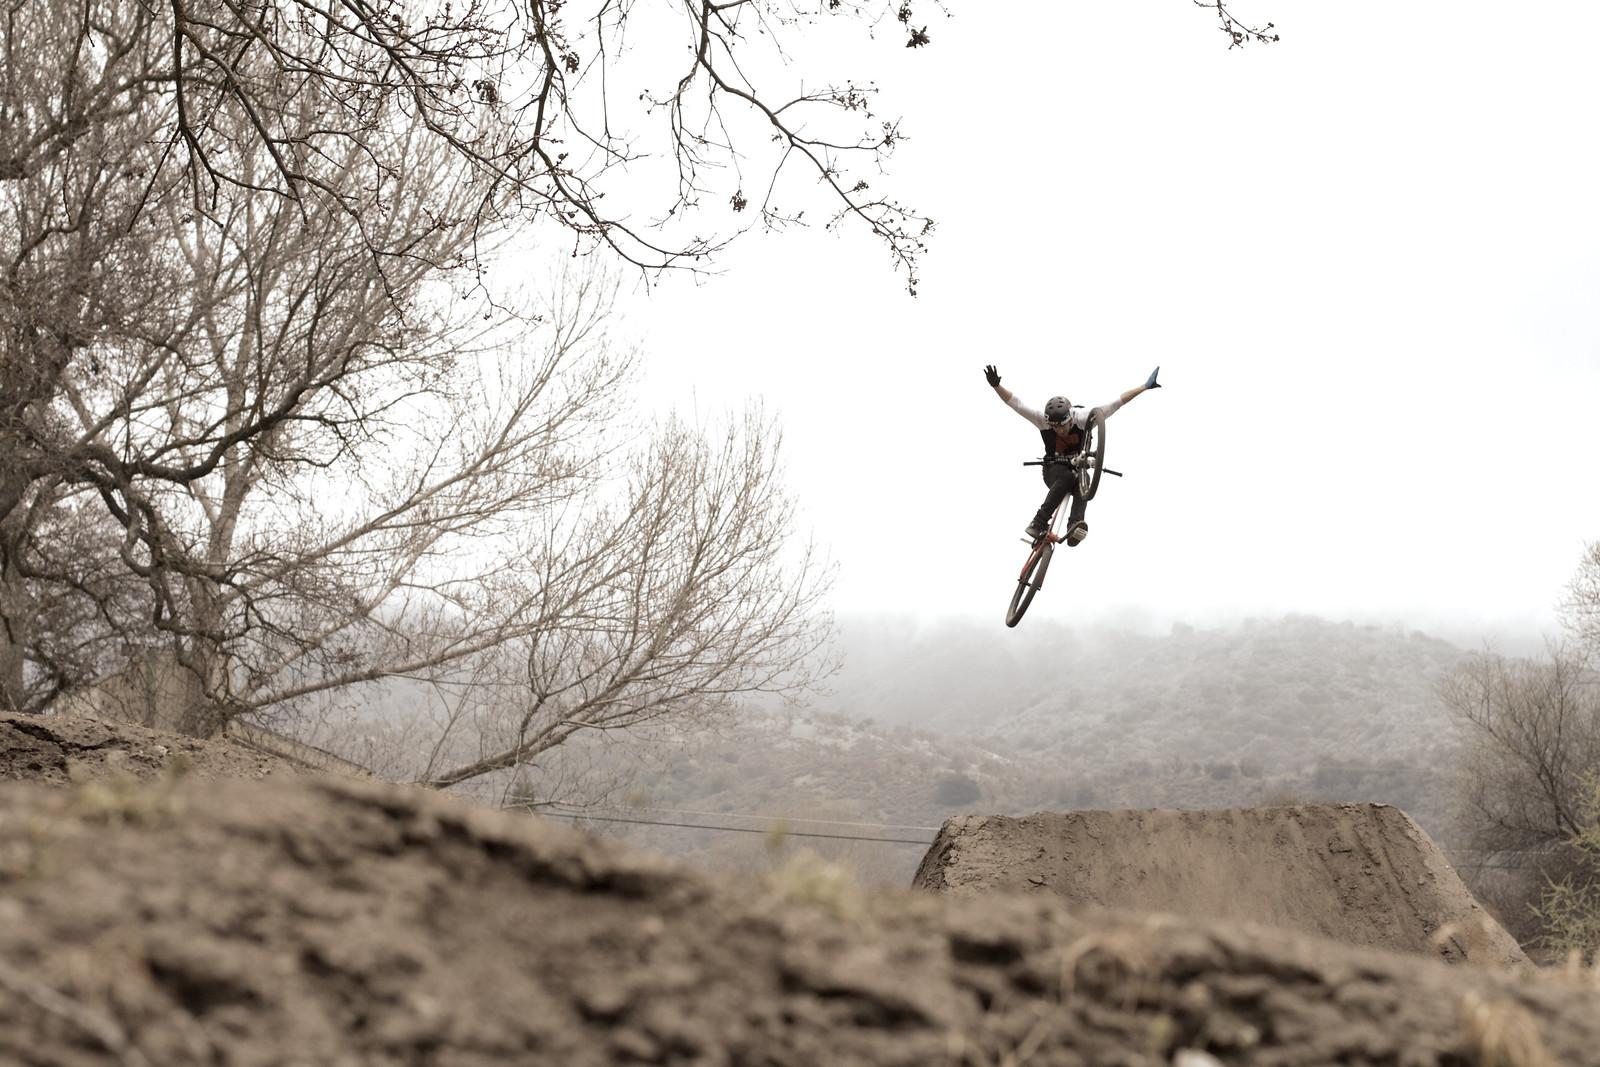 Tyler McCaul Super Session Tuck No Hander - corytepper.com - Mountain Biking Pictures - Vital MTB